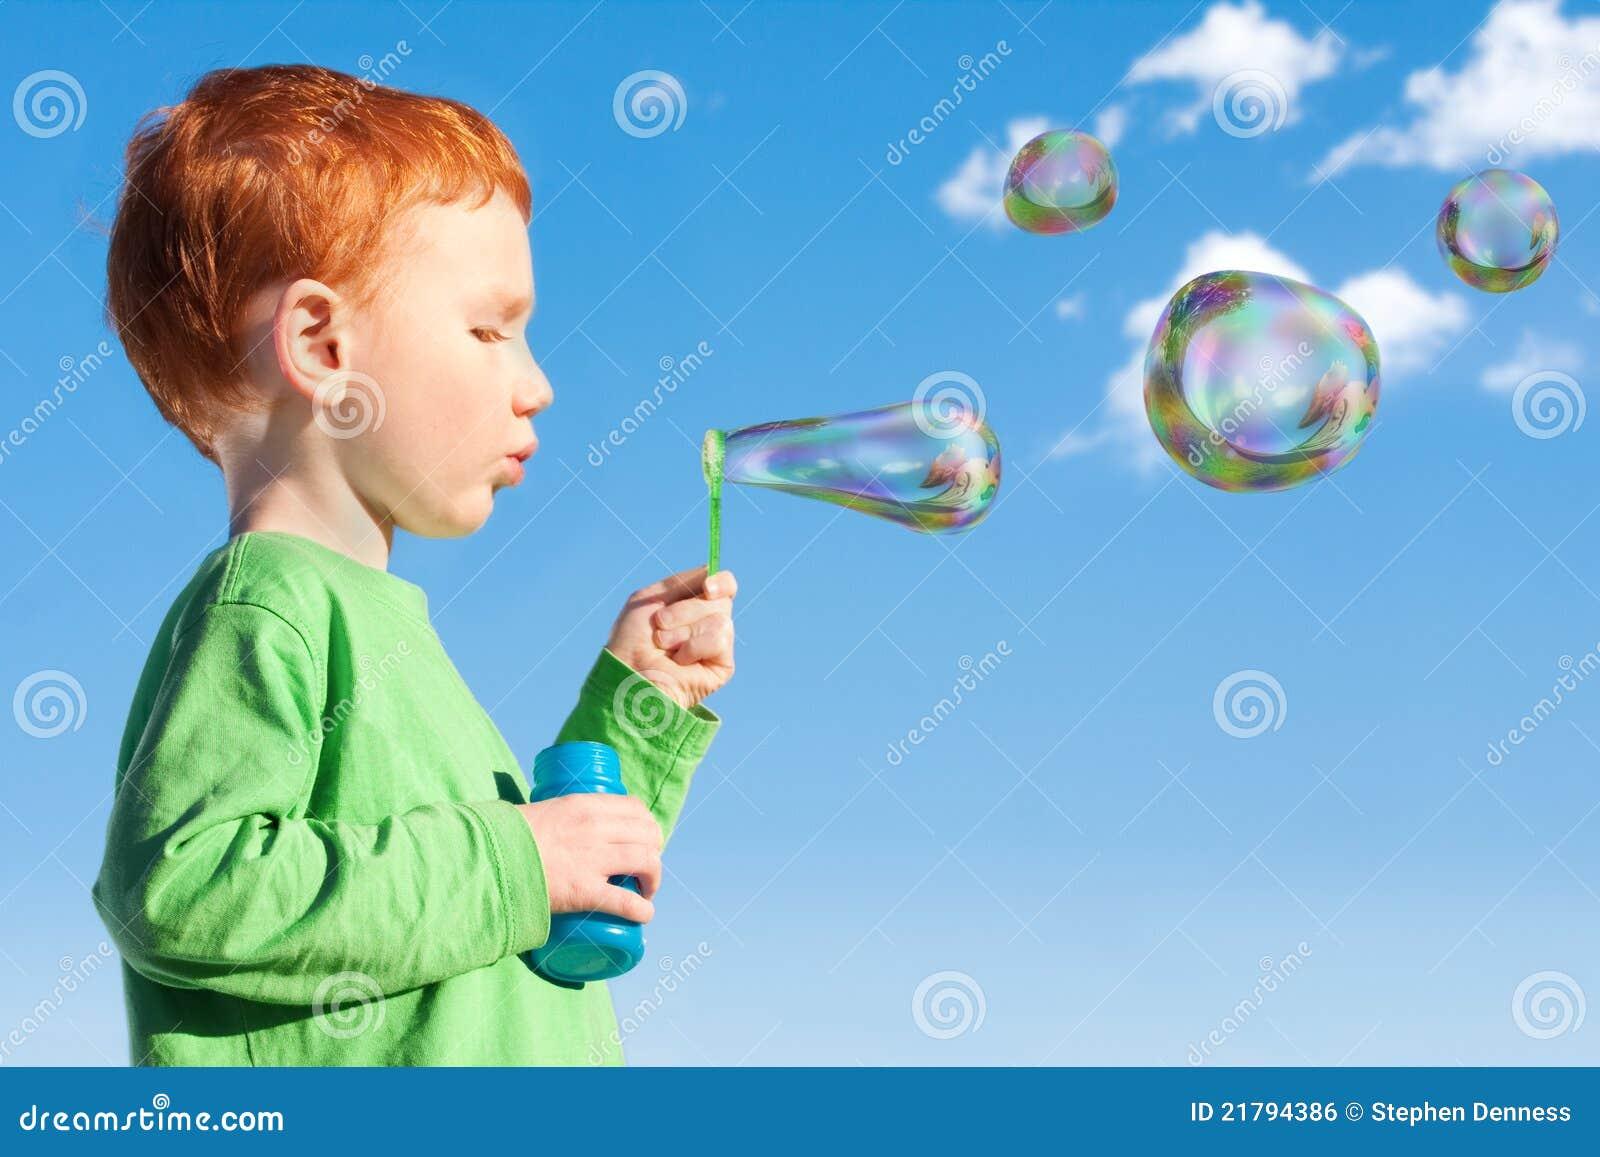 Boy child blowing soap bubbles into sky